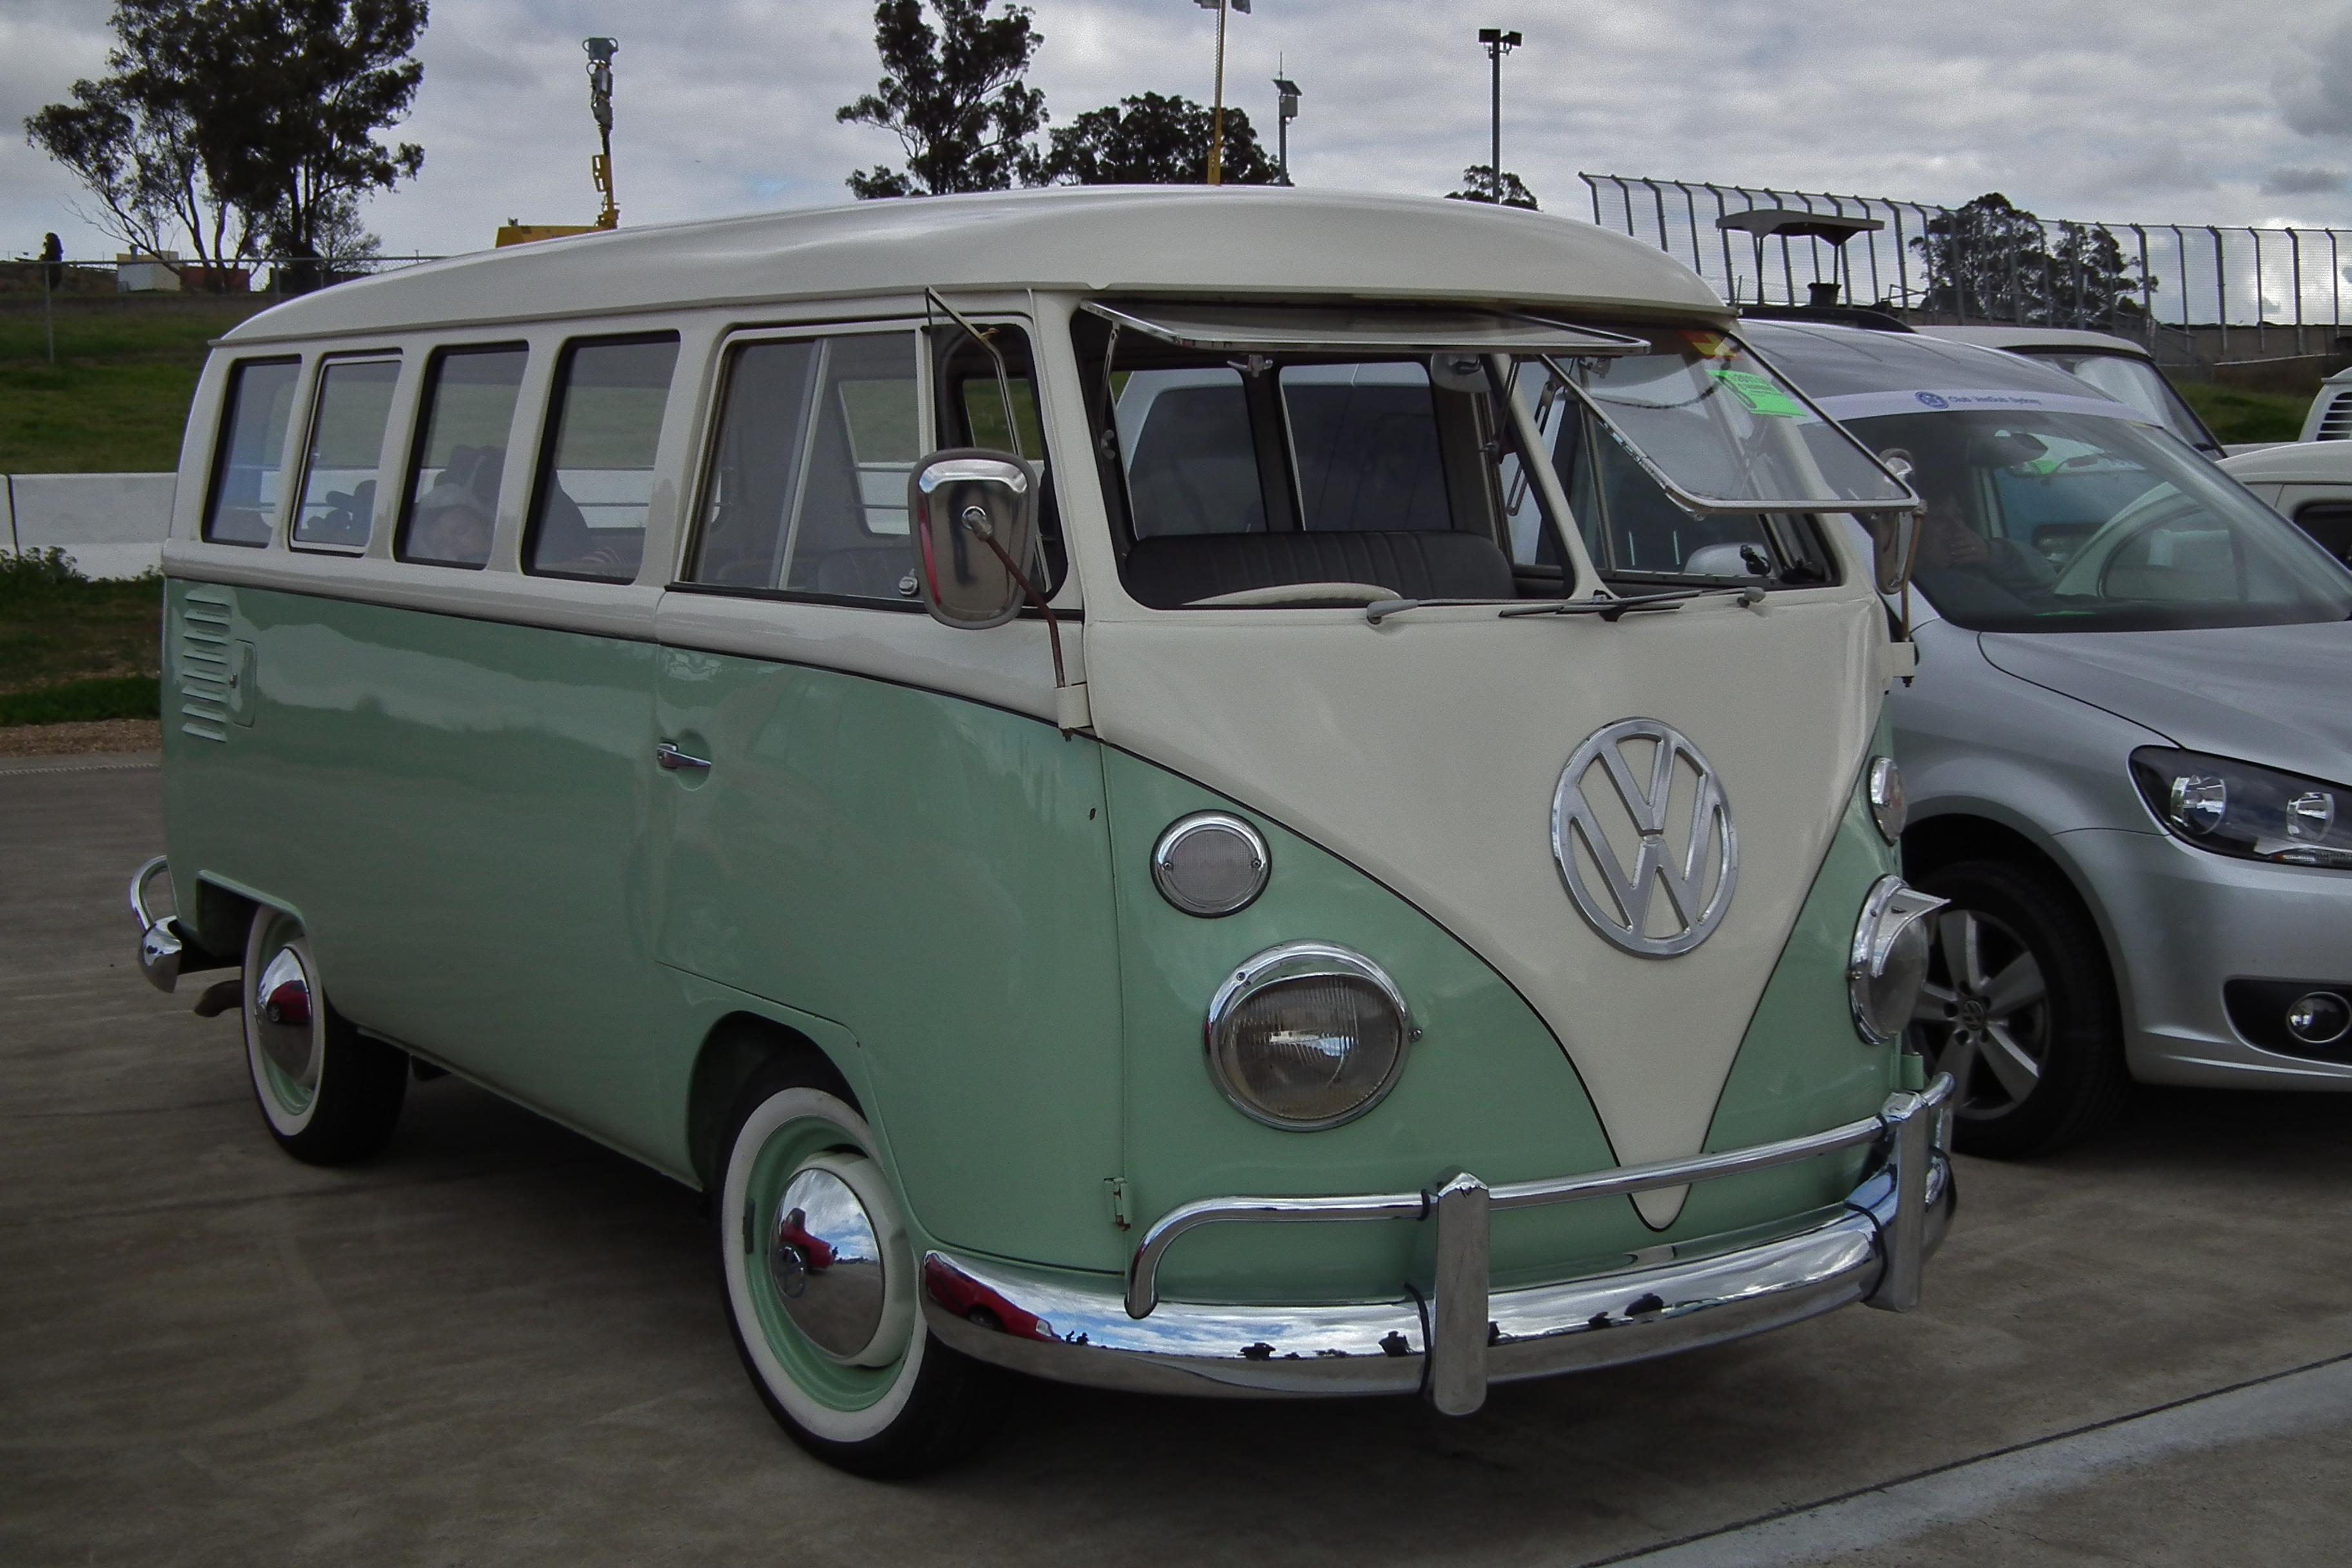 van vw restoration online co split repair air window volkswagen pueblo sale bus cooled sales for